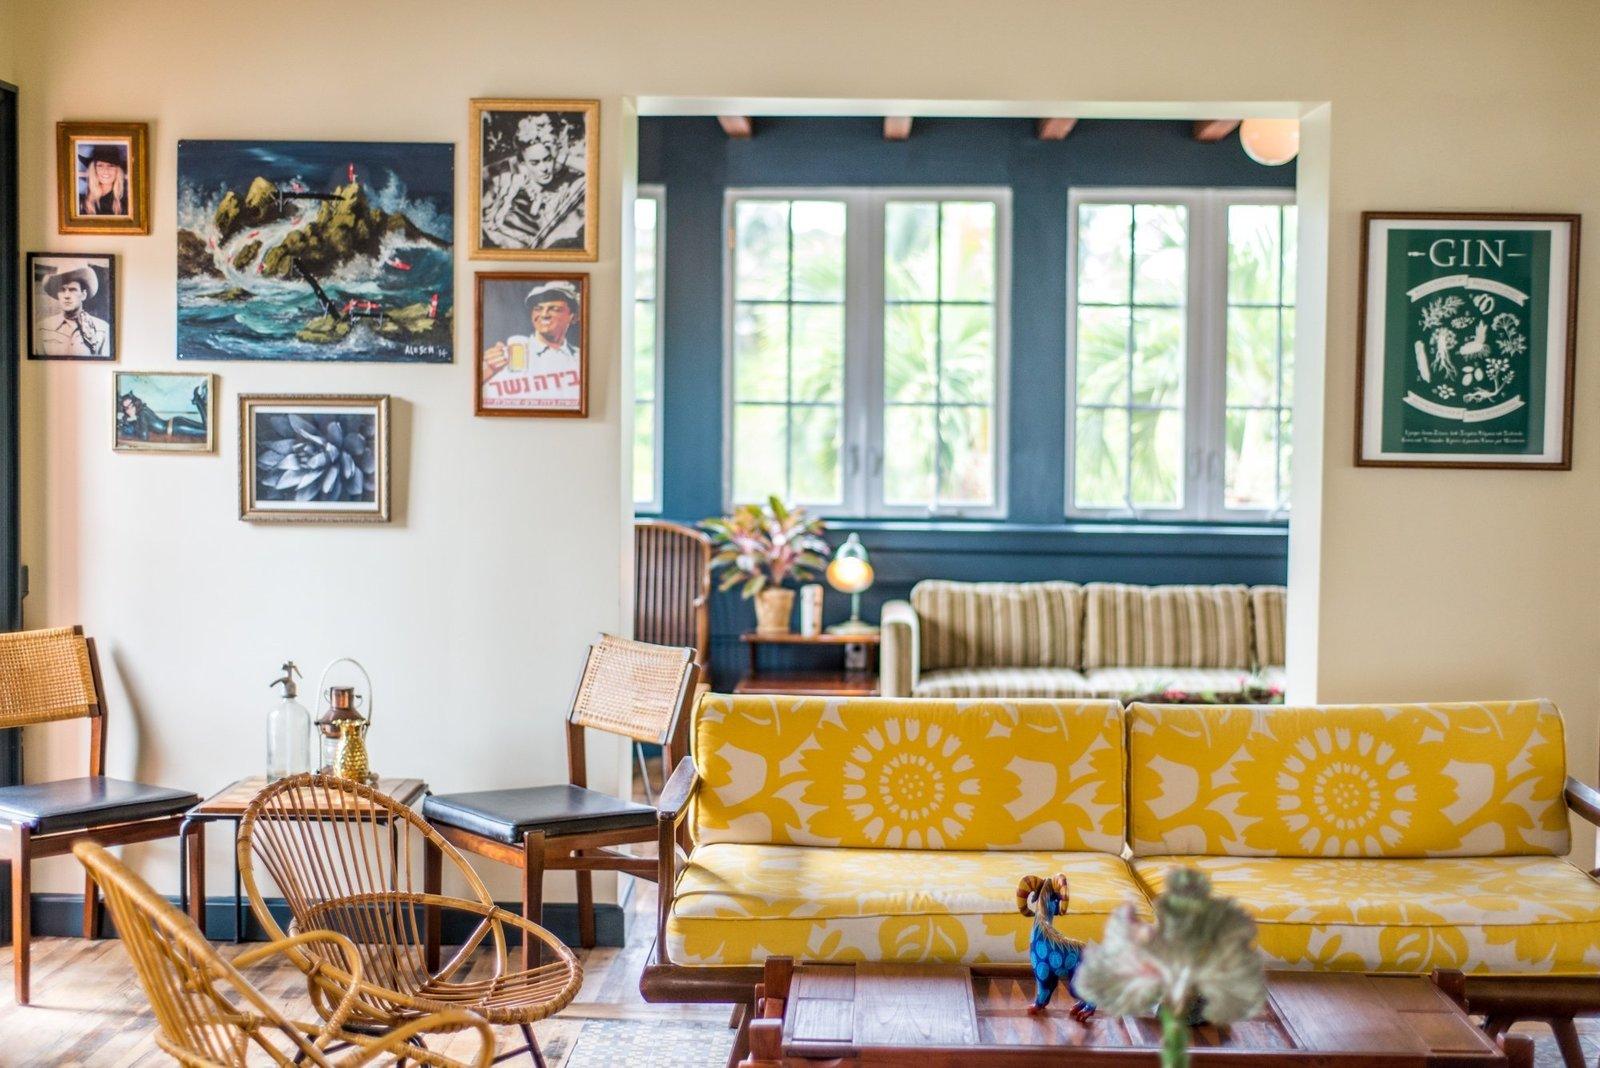 Living Room, Sofa, Coffee Tables, Medium Hardwood Floor, End Tables, Rug Floor, Chair, and Table Lighting  Miami Freehand